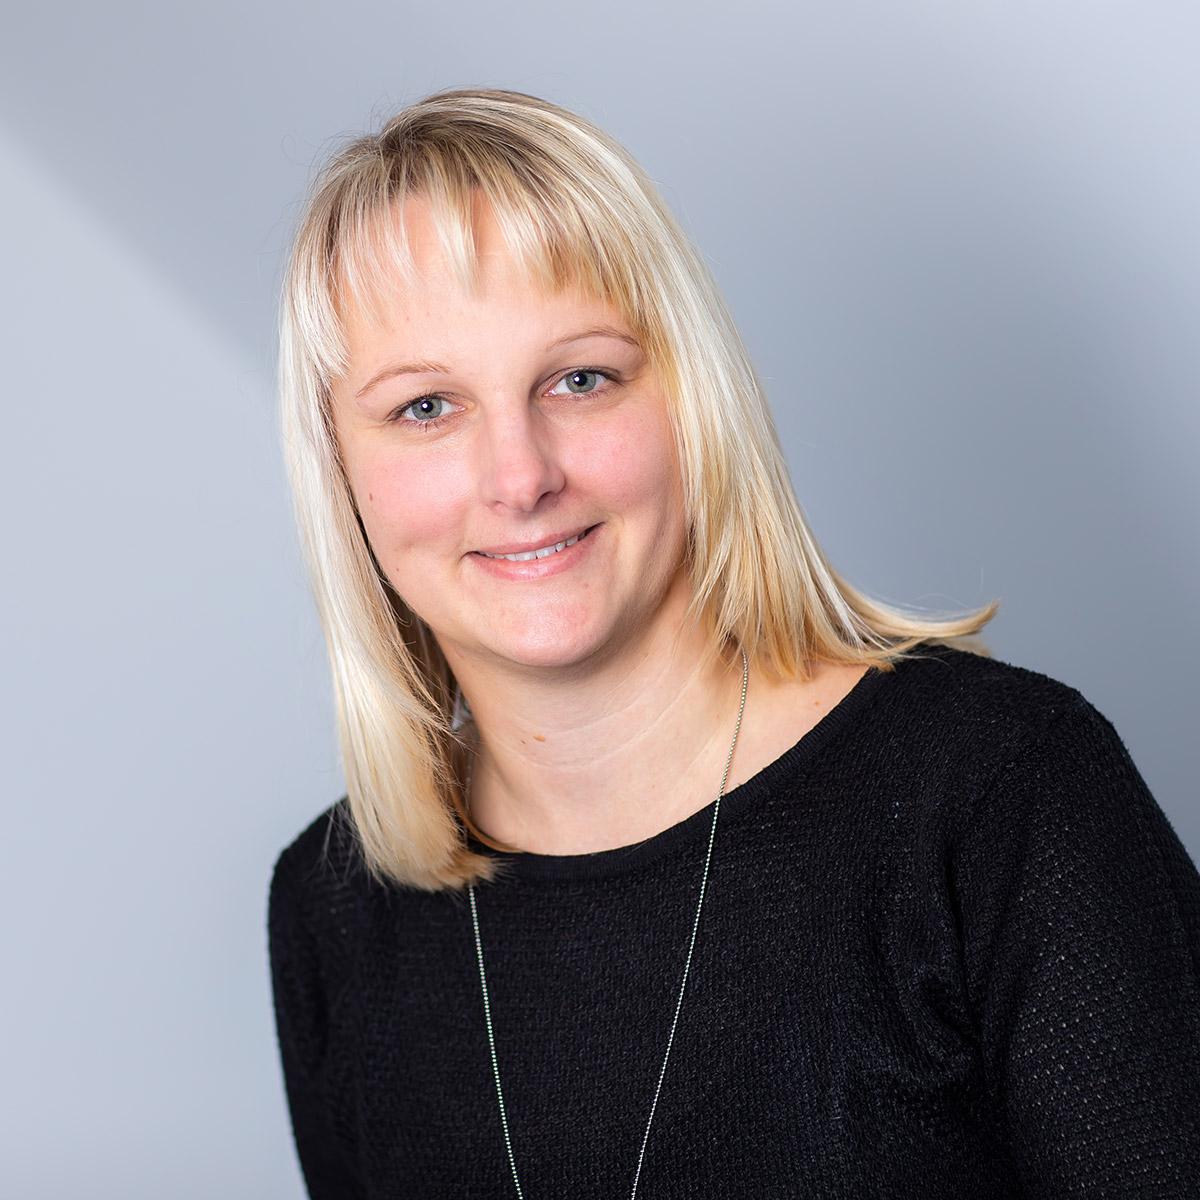 Sandra Götz